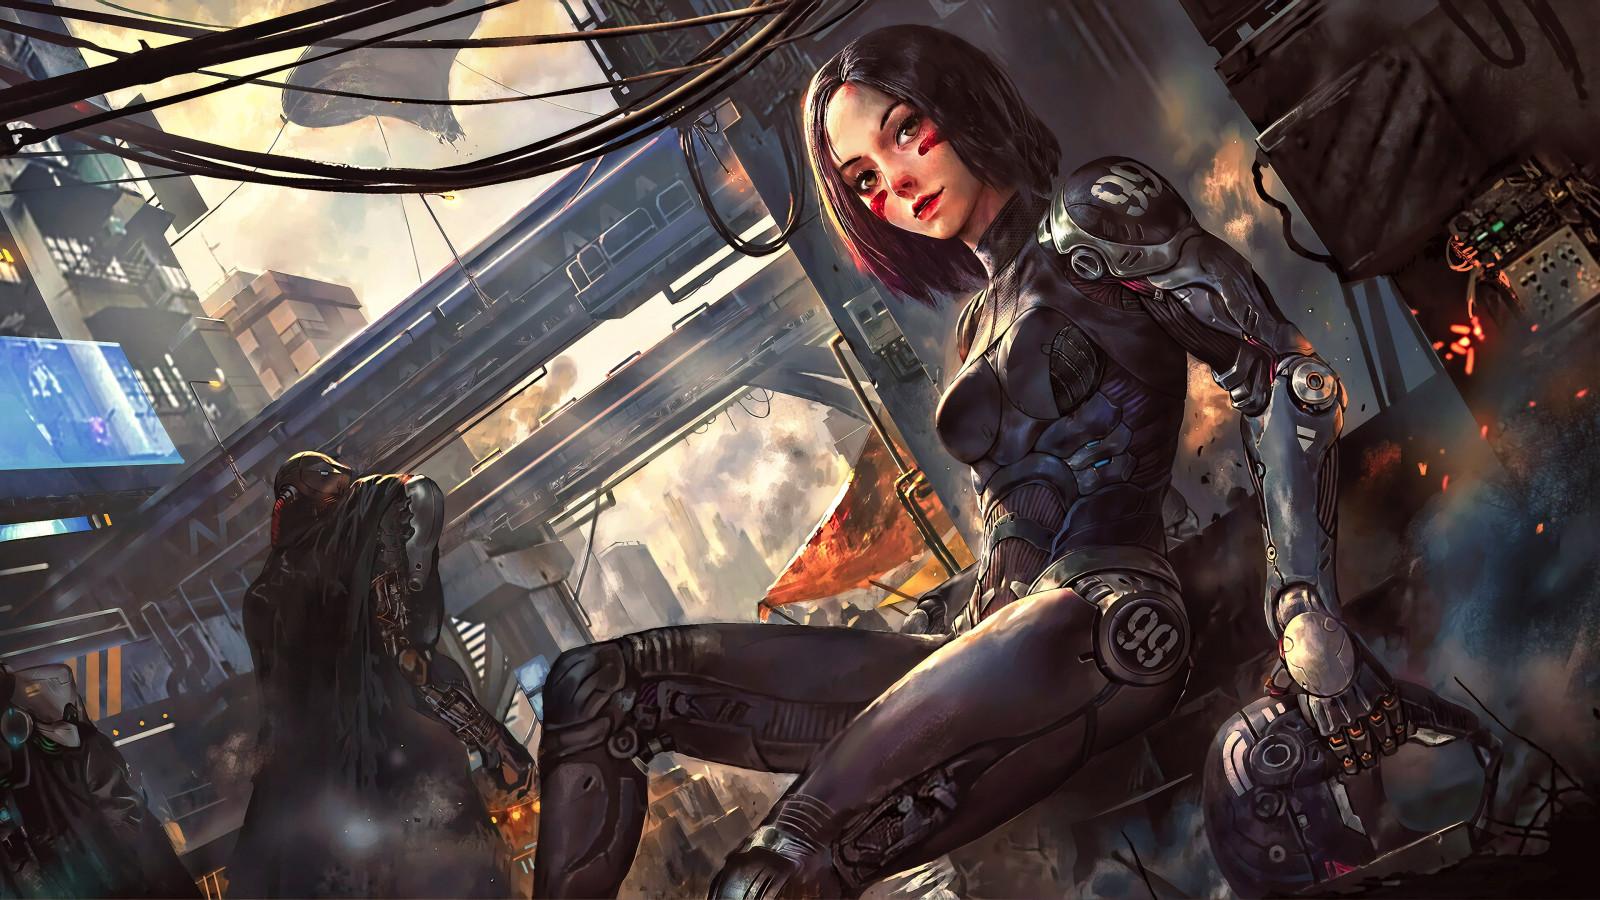 Wallpaper : black hair, cyberpunk, anime girls, futuristic ...